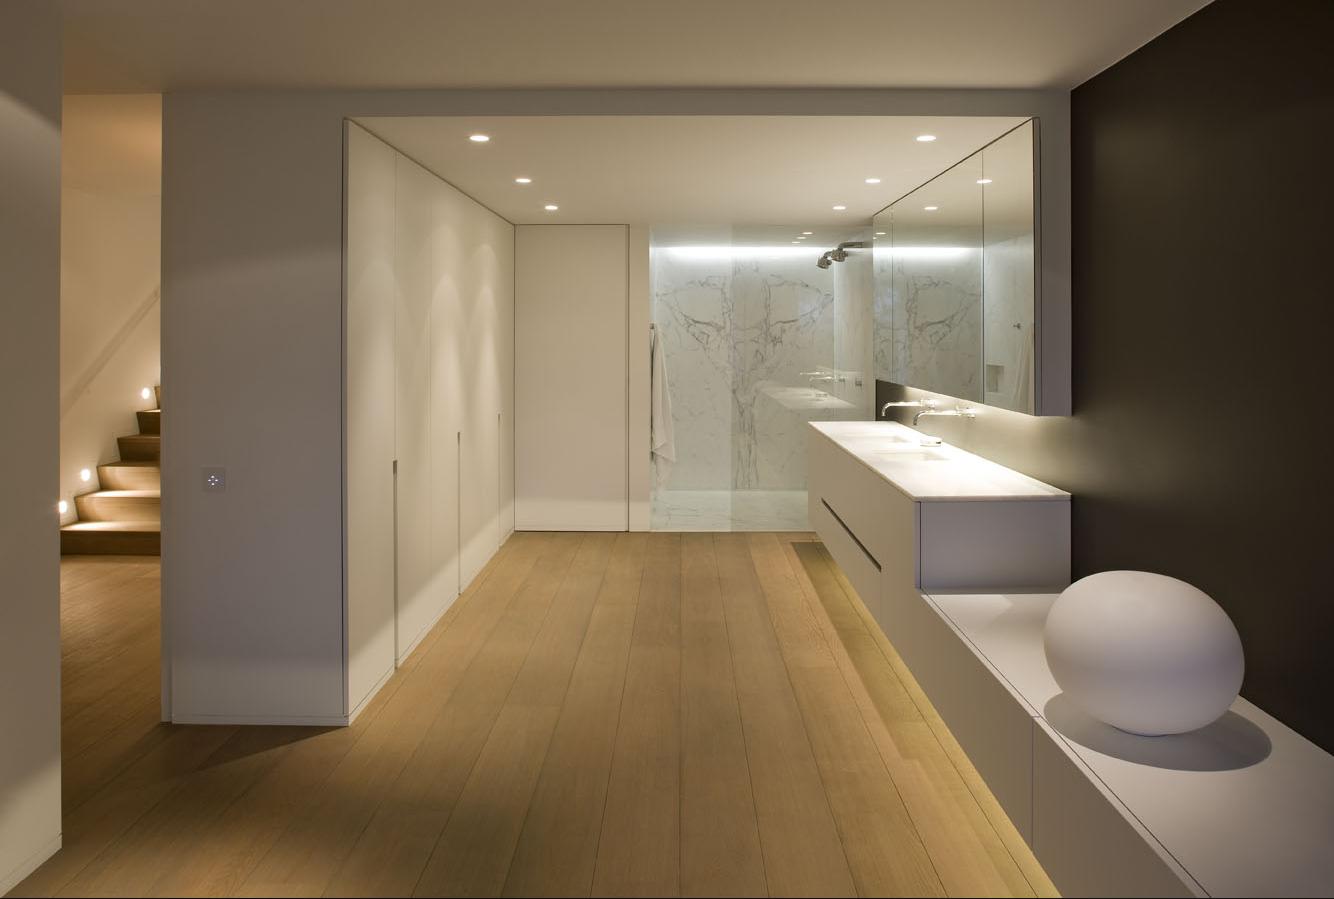 https://interieurdesigner.nl/frontend/files/userfiles/images/projecten/dsm-interior-projects/design-badkamer-parket.png